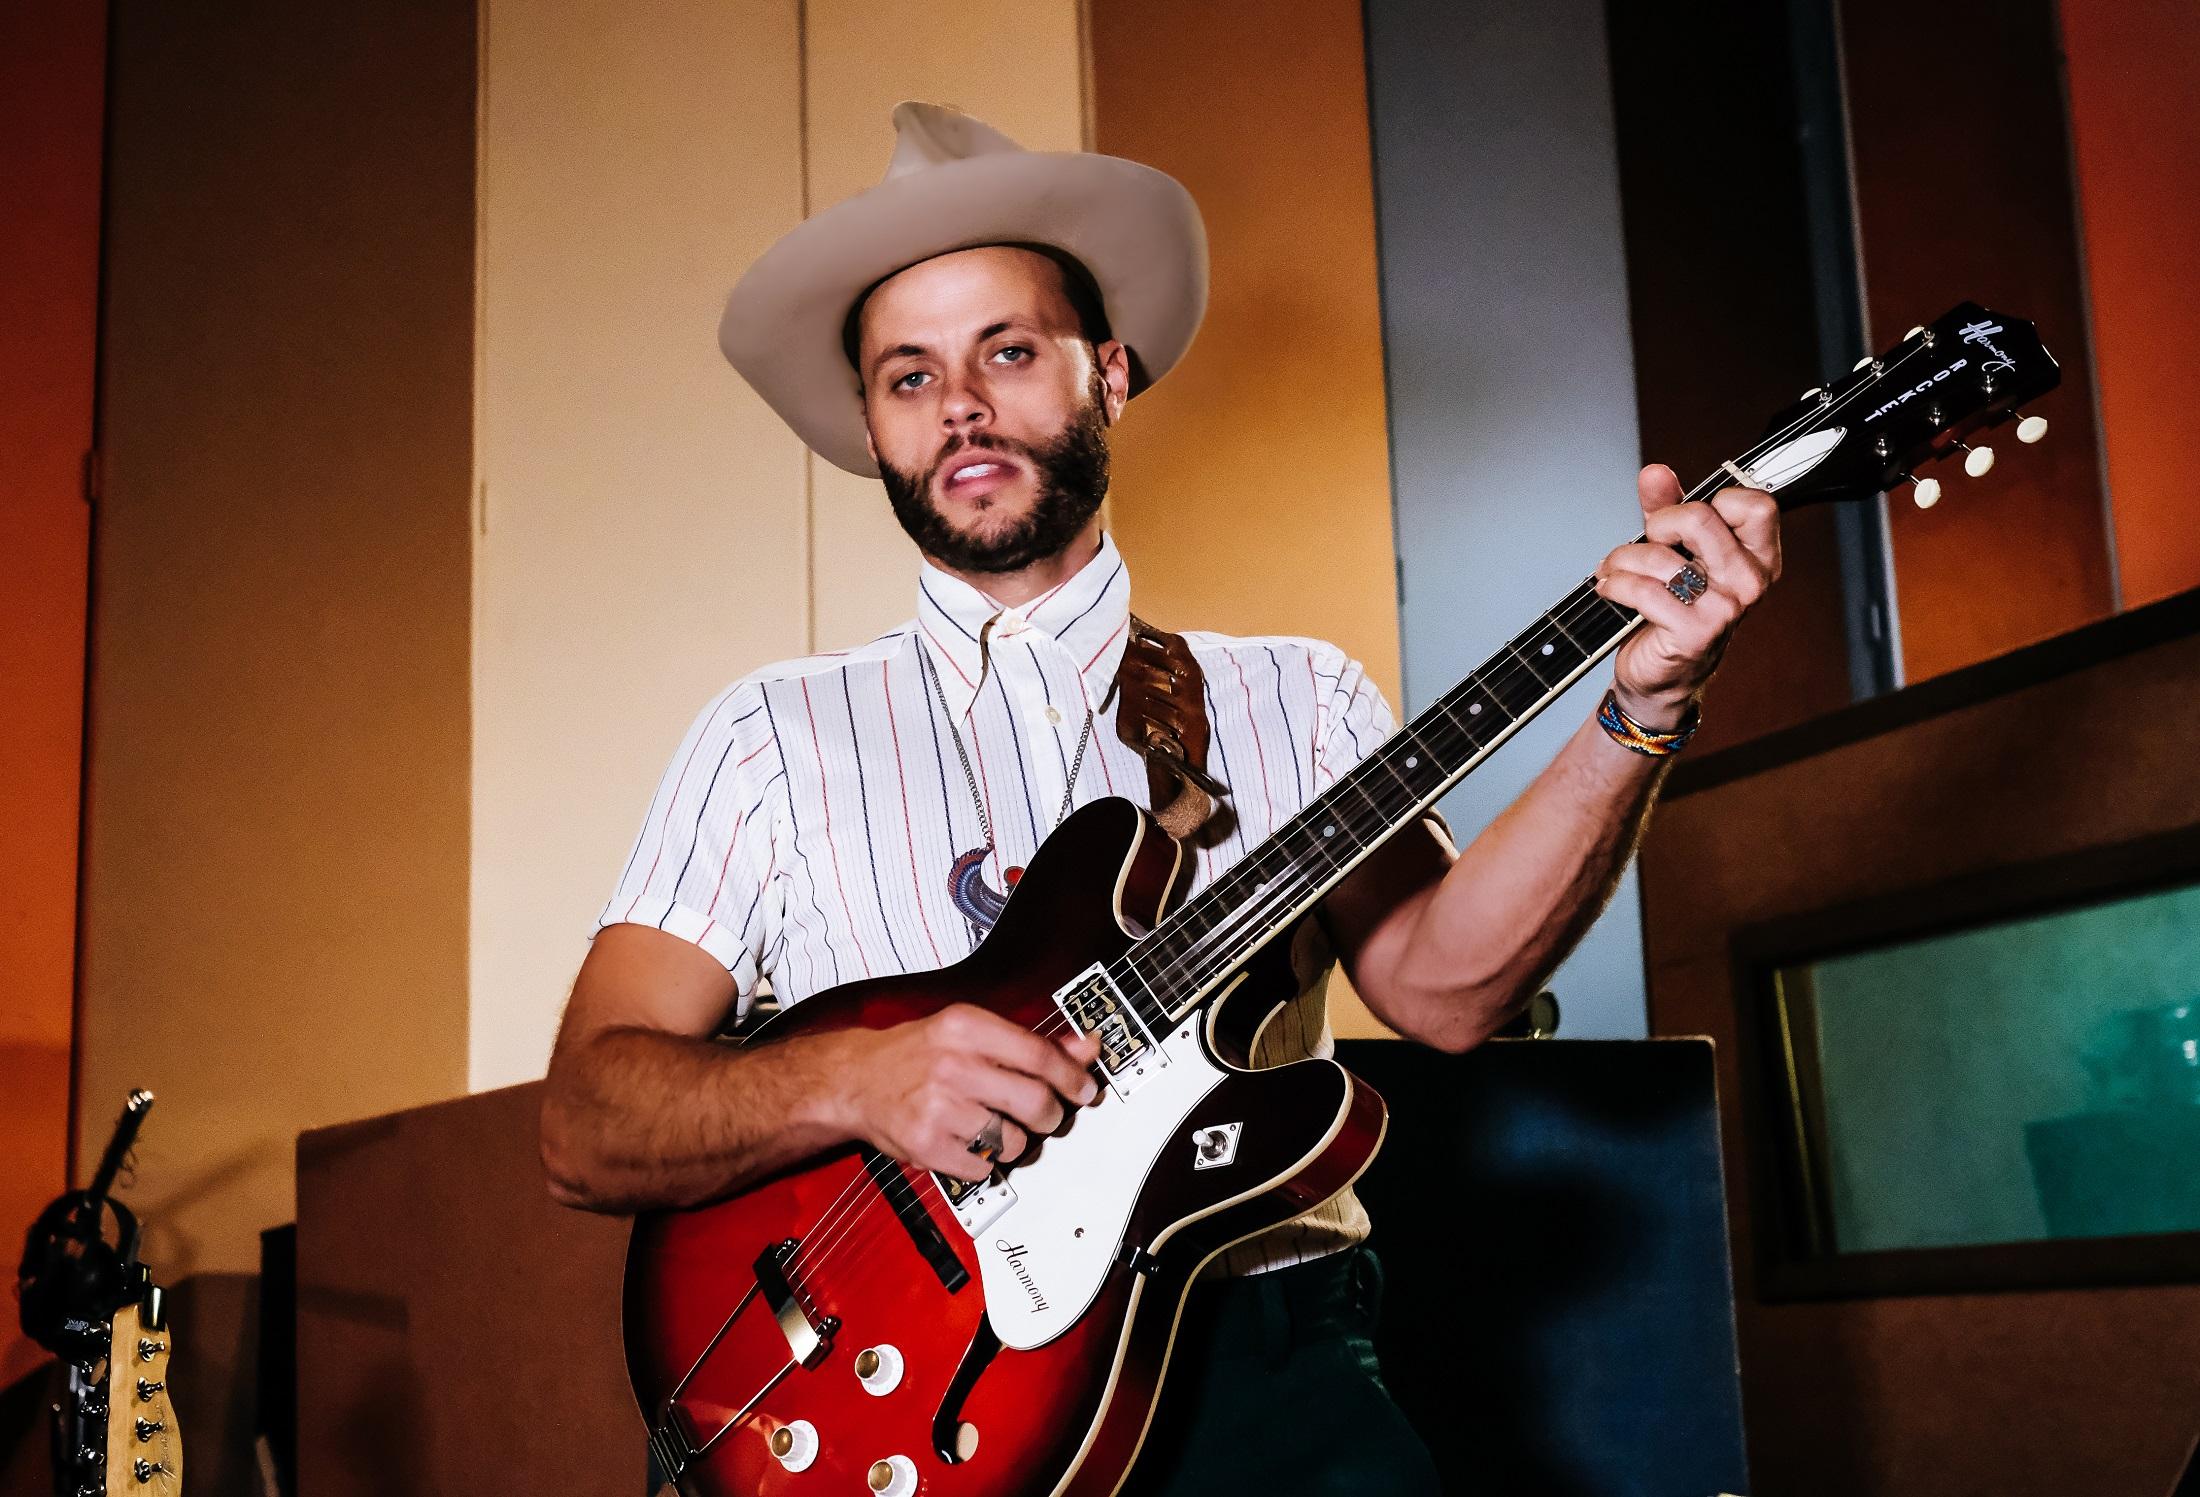 The String - Charley Crockett